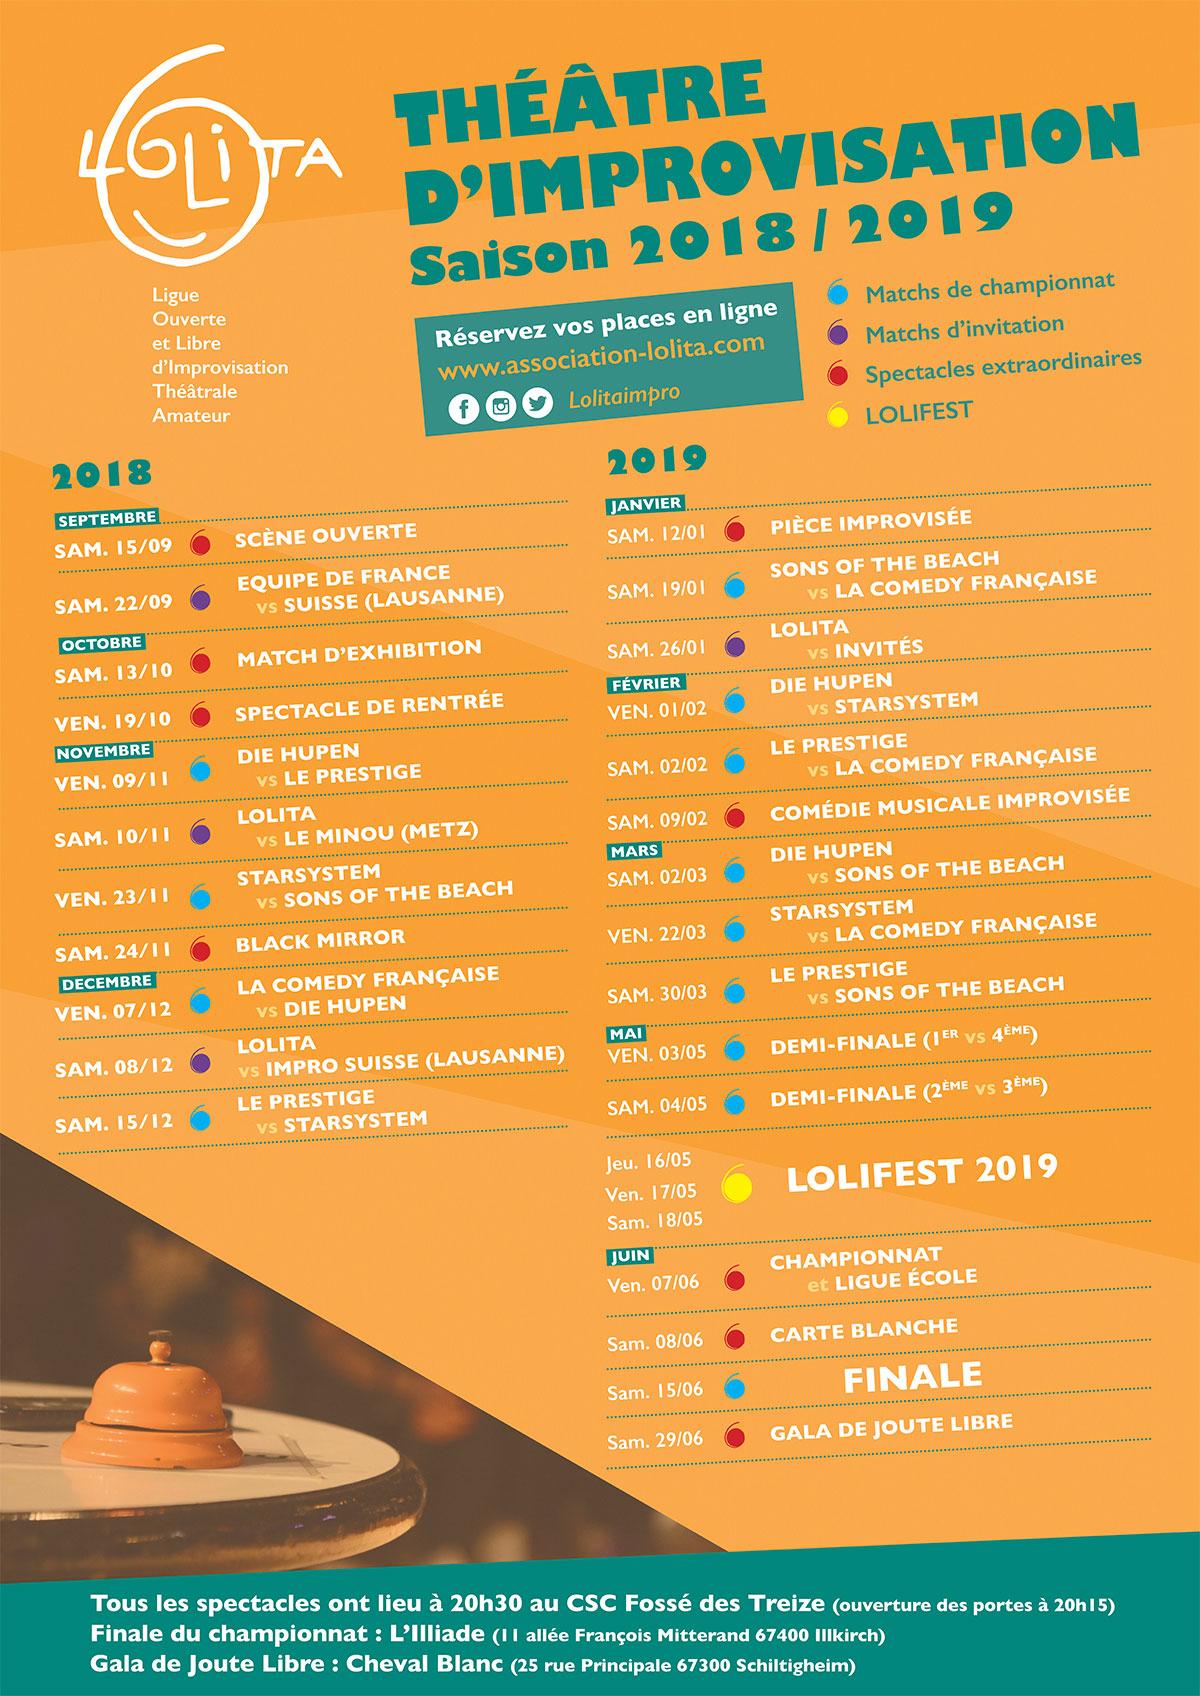 Comedie Francaise Calendrier.Le Calendrier Du Championnat De La Lolita 2018 2019 Lolita